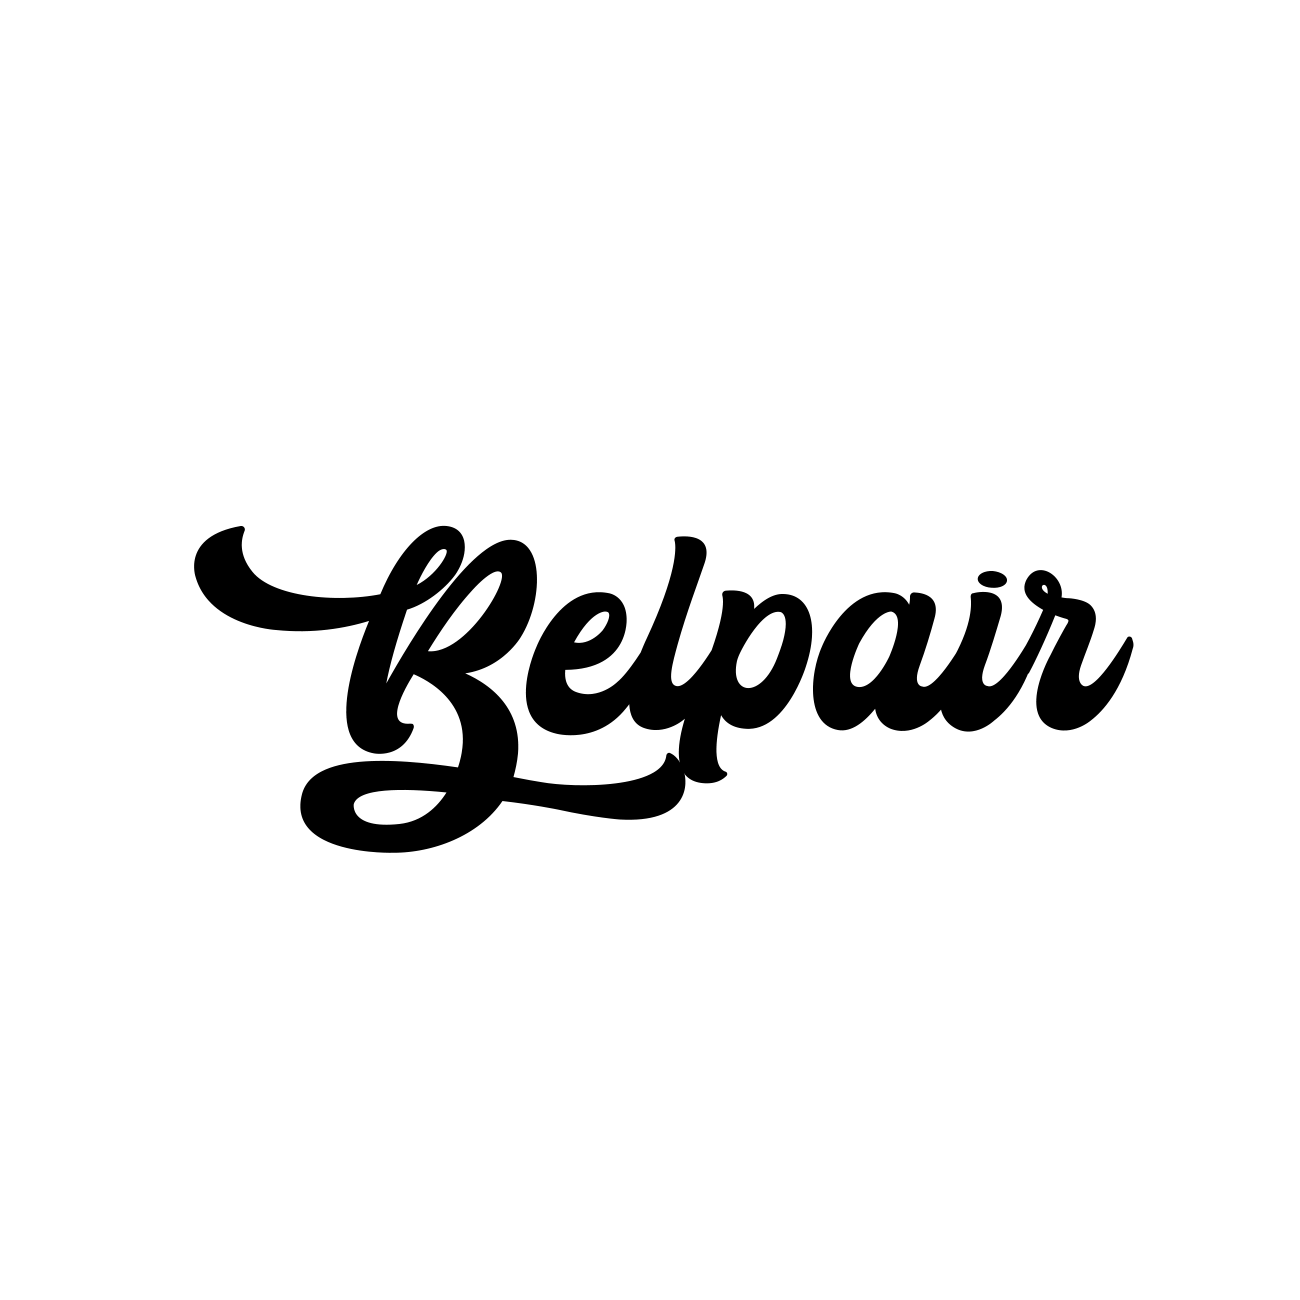 Logo Belpair png noir